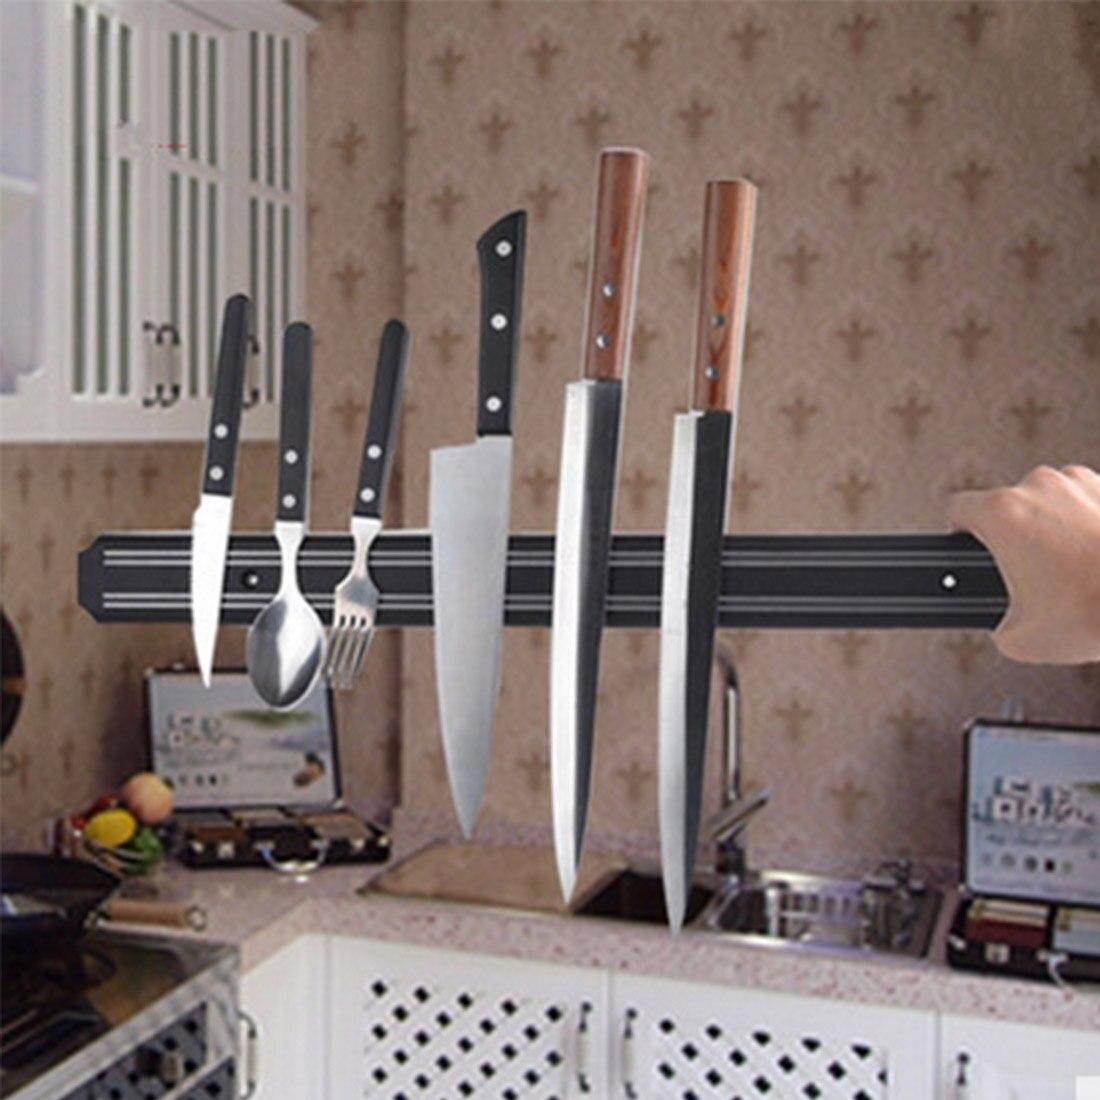 330x34x15mm Magnetic Knife Holder Wall Mount Black ABS Placstic Magnet Knife Holder For Metal Knife